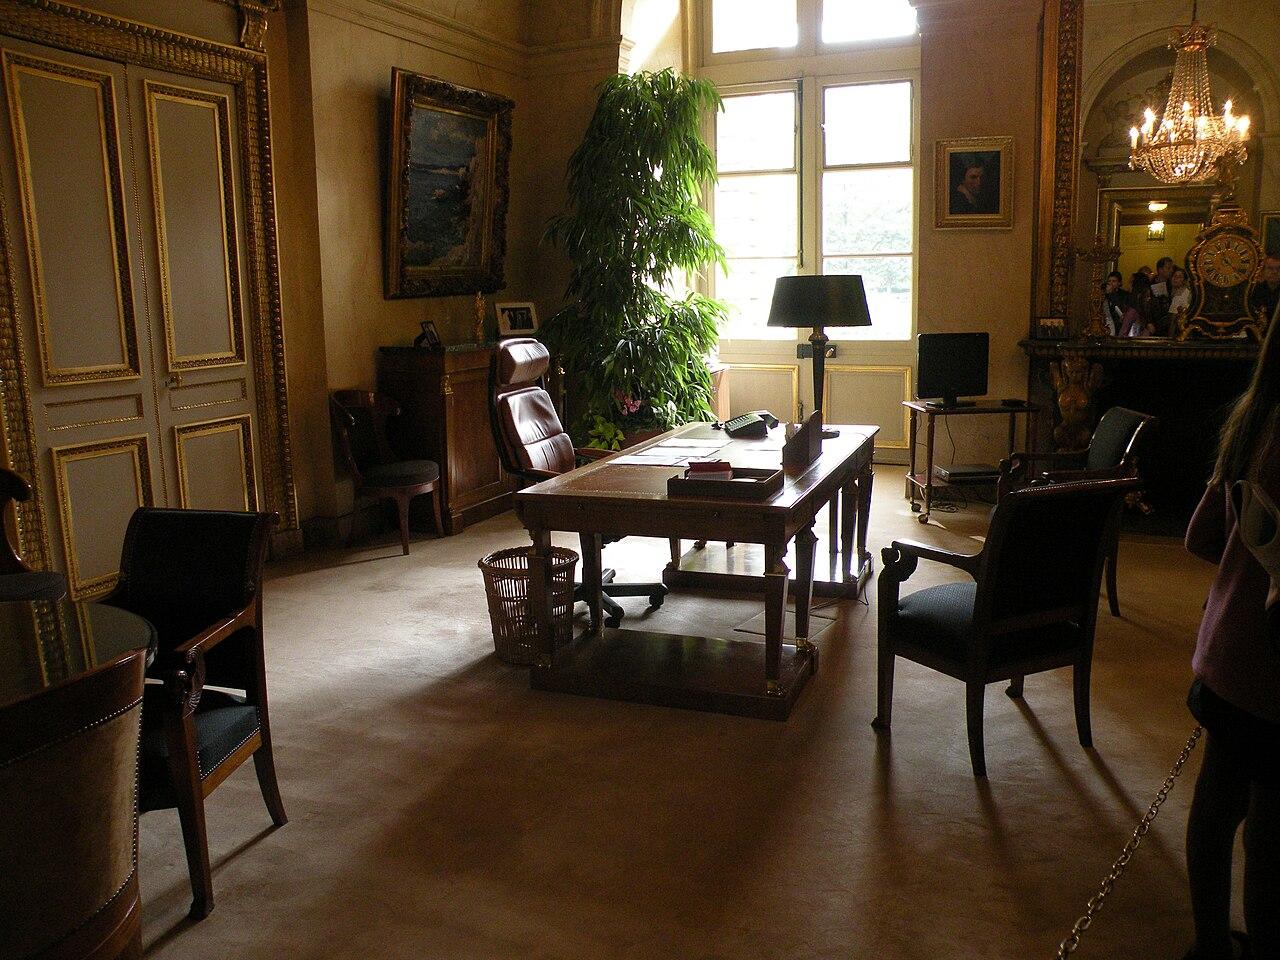 file bureau vice pr sident s nat2 jpg wikimedia commons. Black Bedroom Furniture Sets. Home Design Ideas